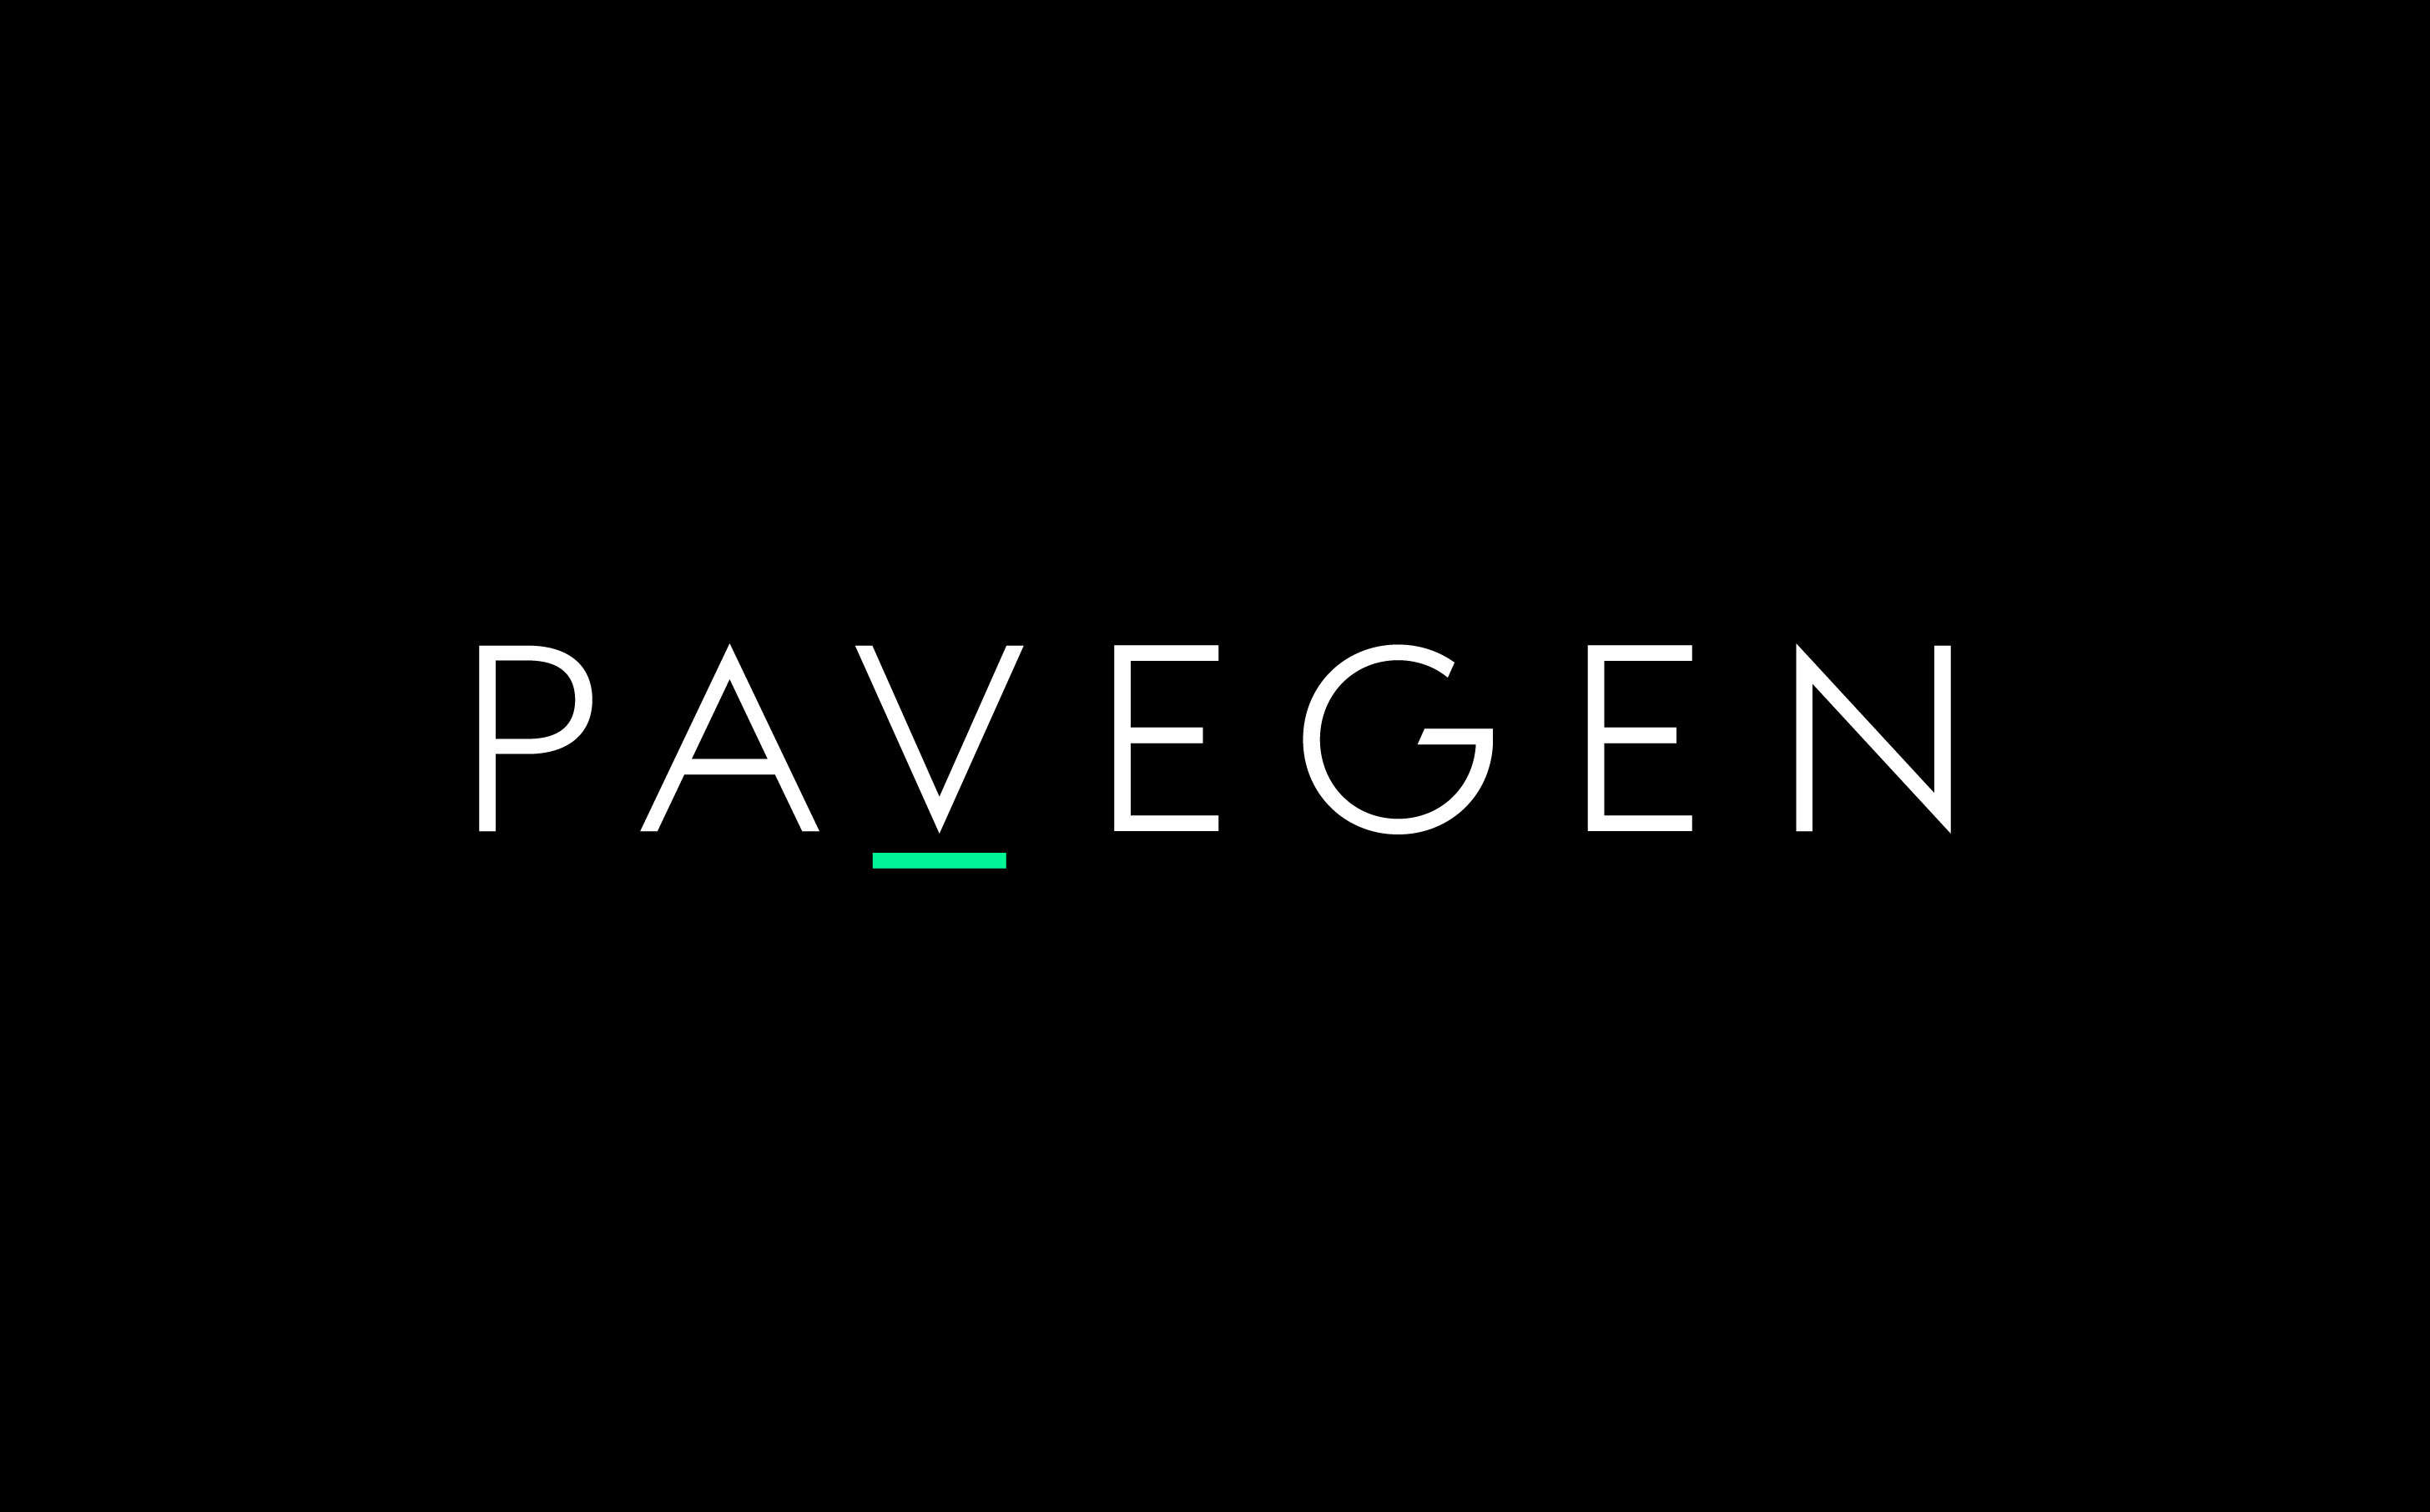 pavegen-logo-design